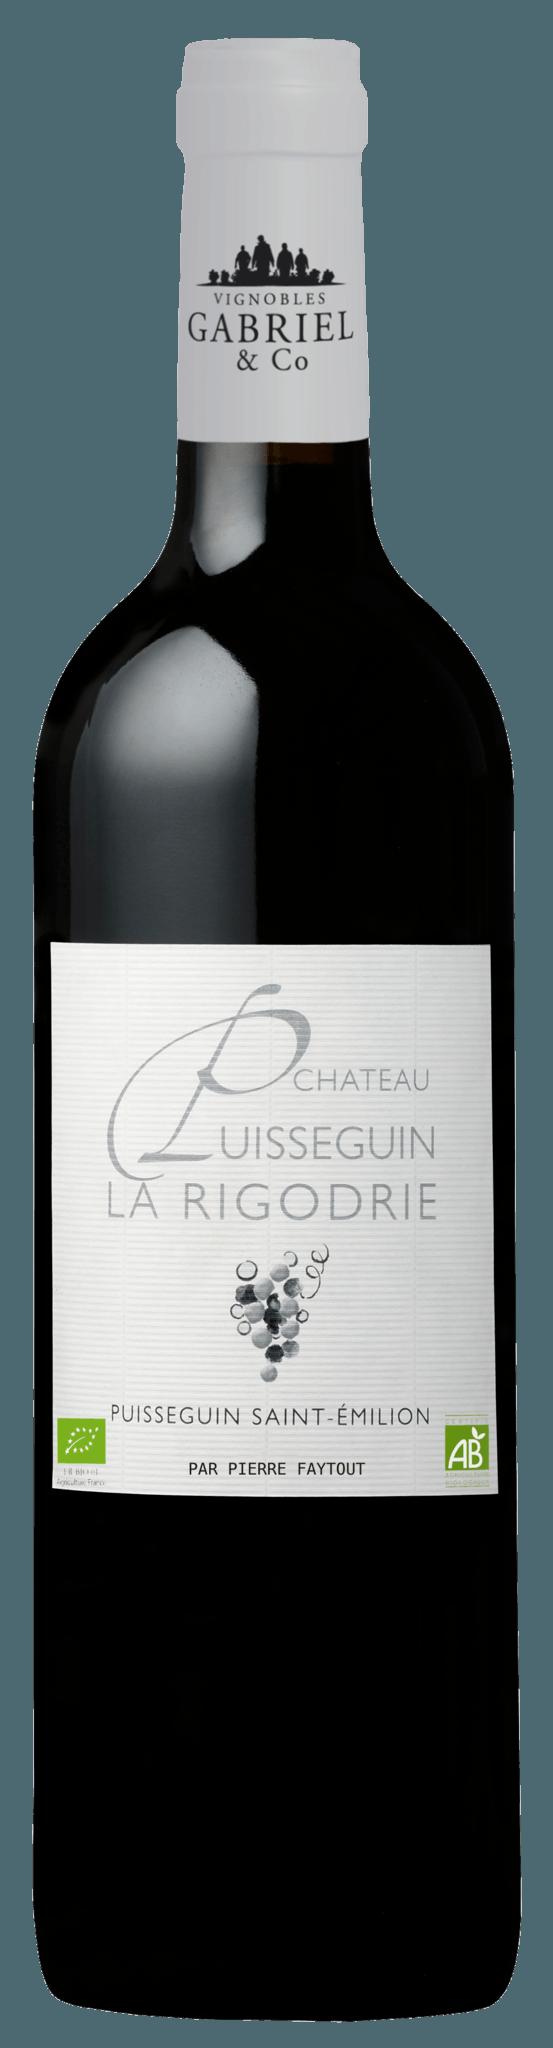 Château Puisseguin La Rigodrie